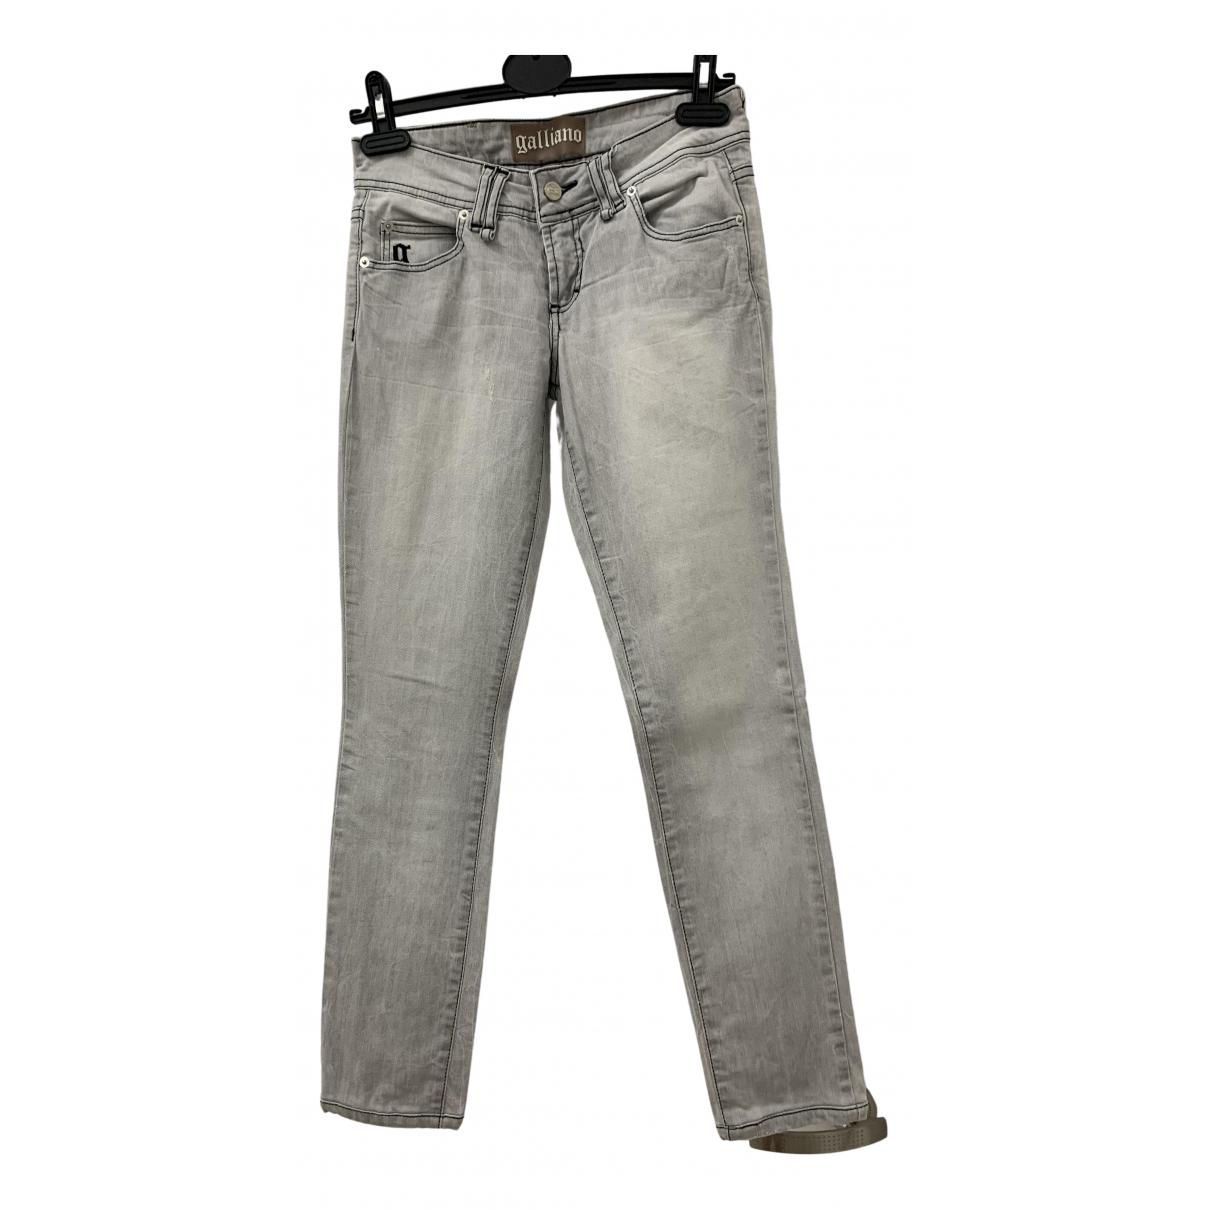 Galliano - Jean   pour femme en coton - elasthane - gris